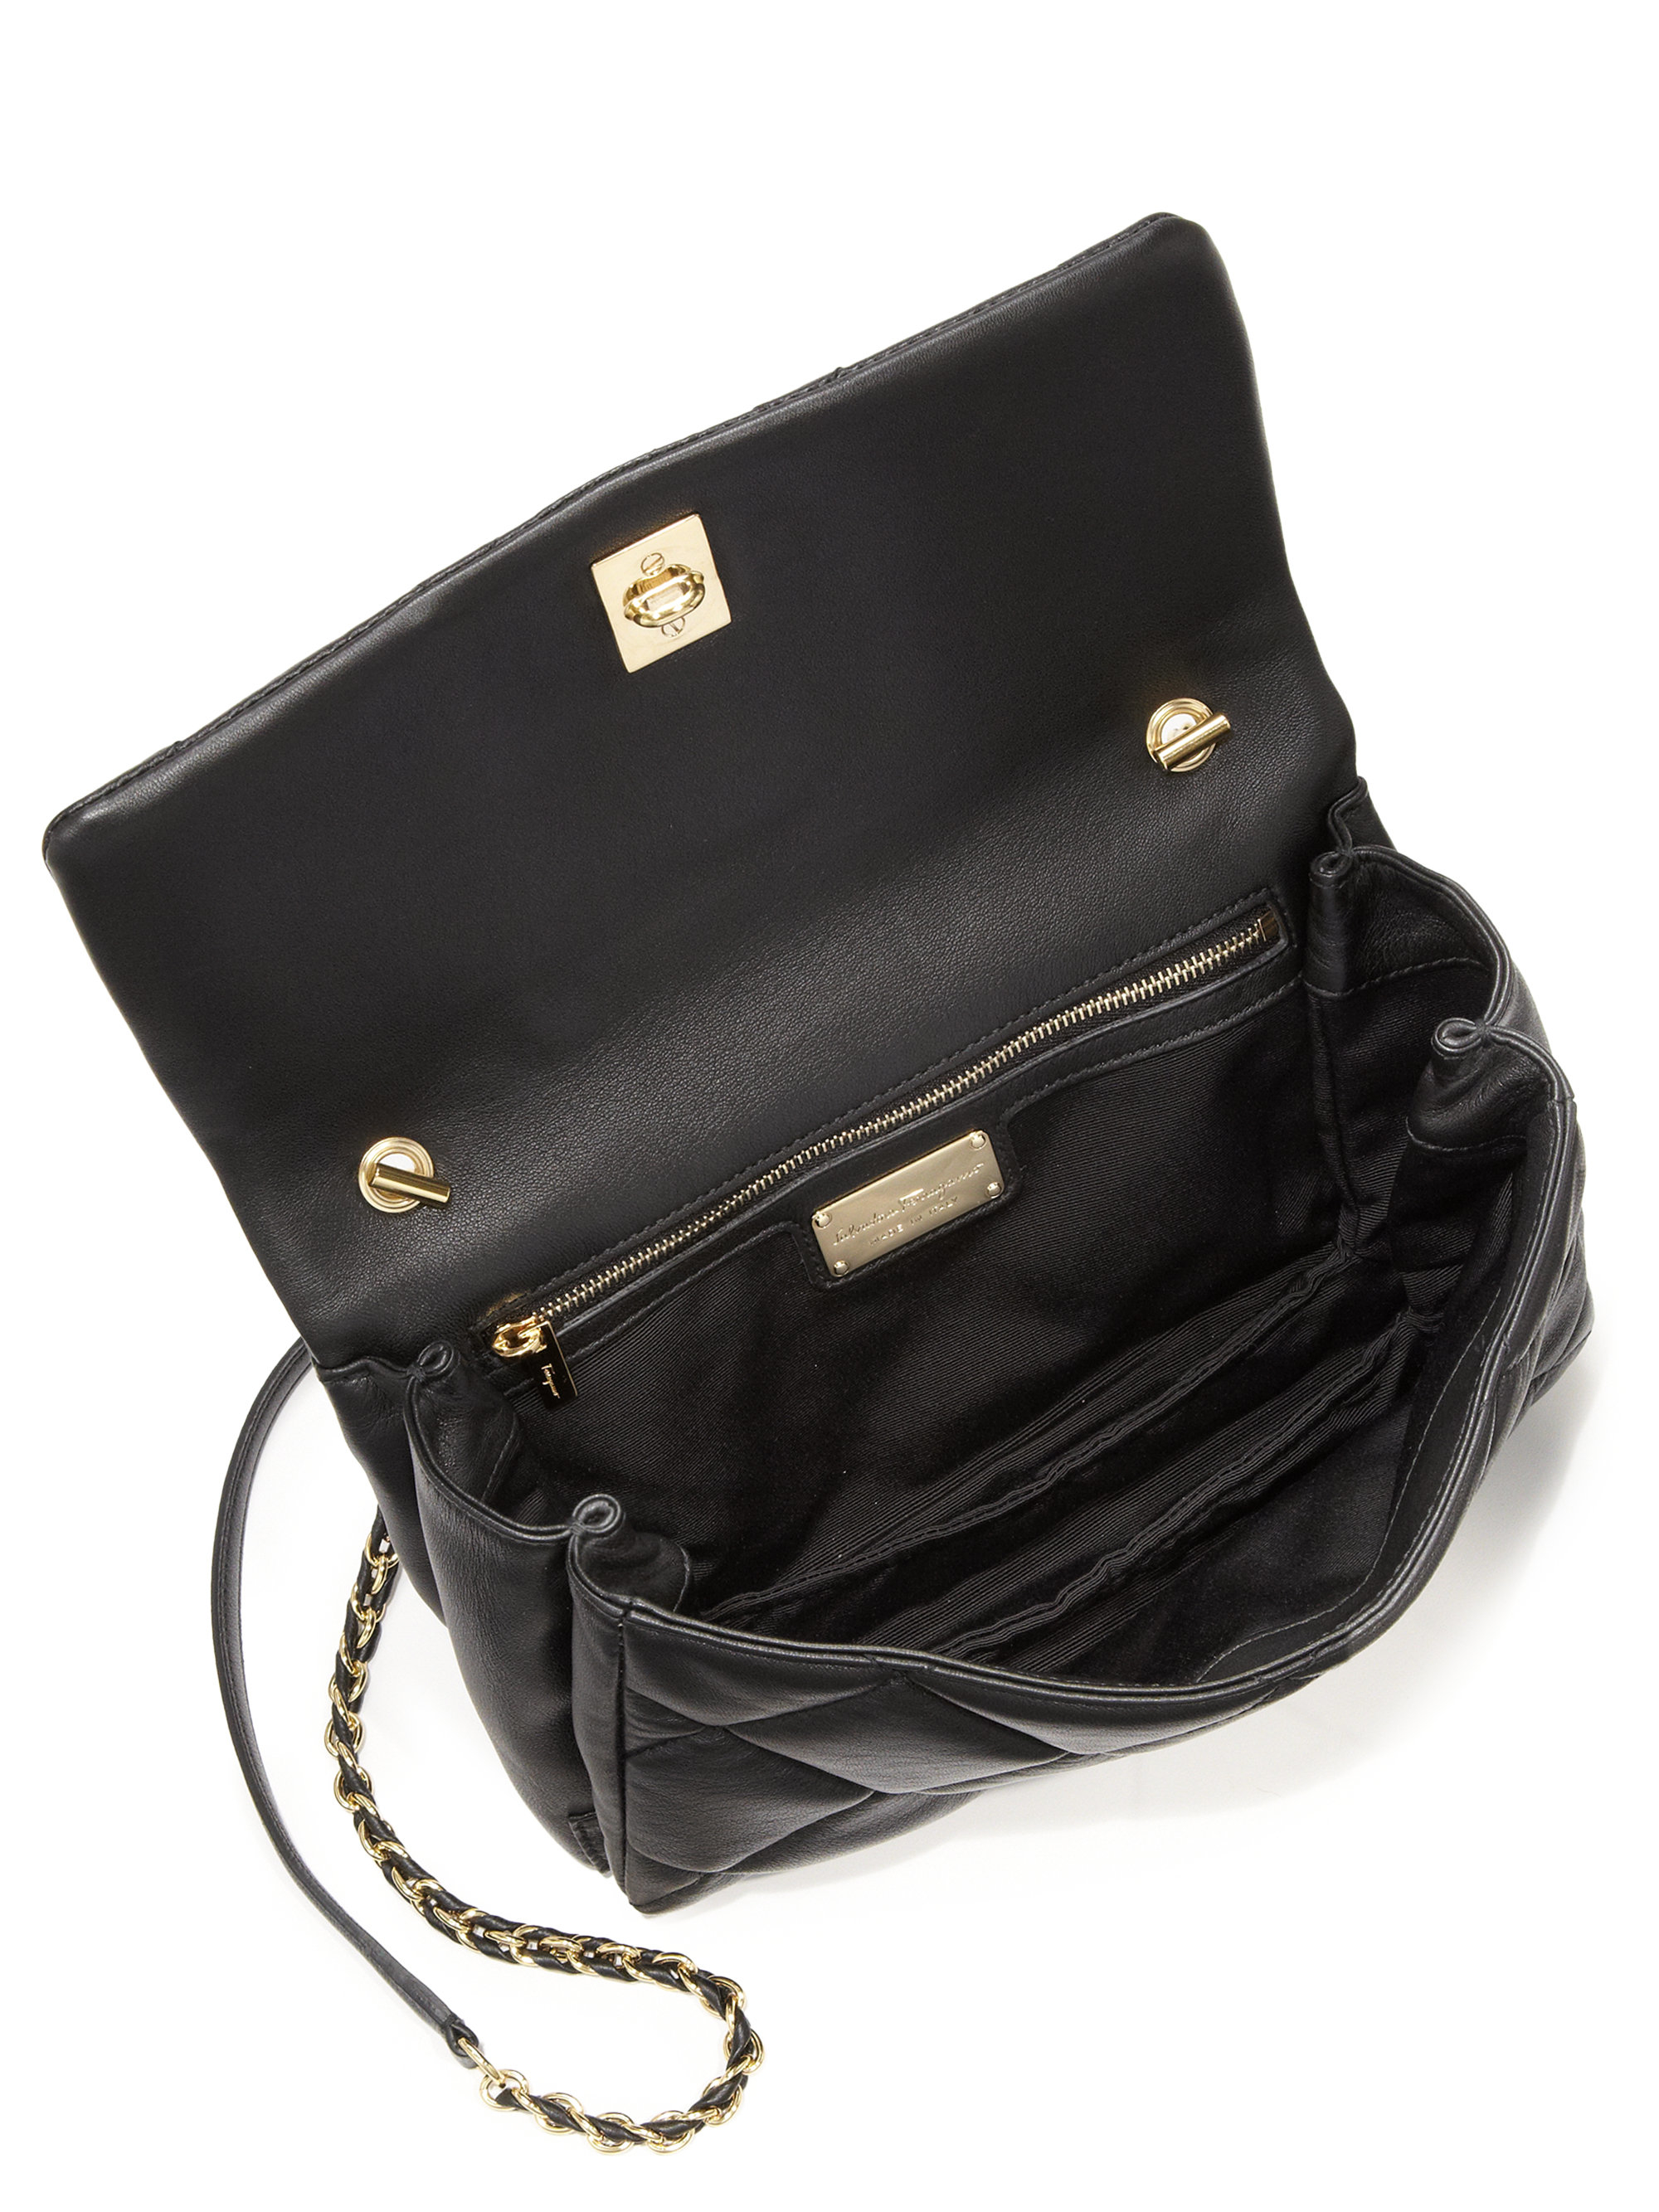 611c57389317 Ferragamo Vara Quilted Leather Flap Bag In Black Lyst